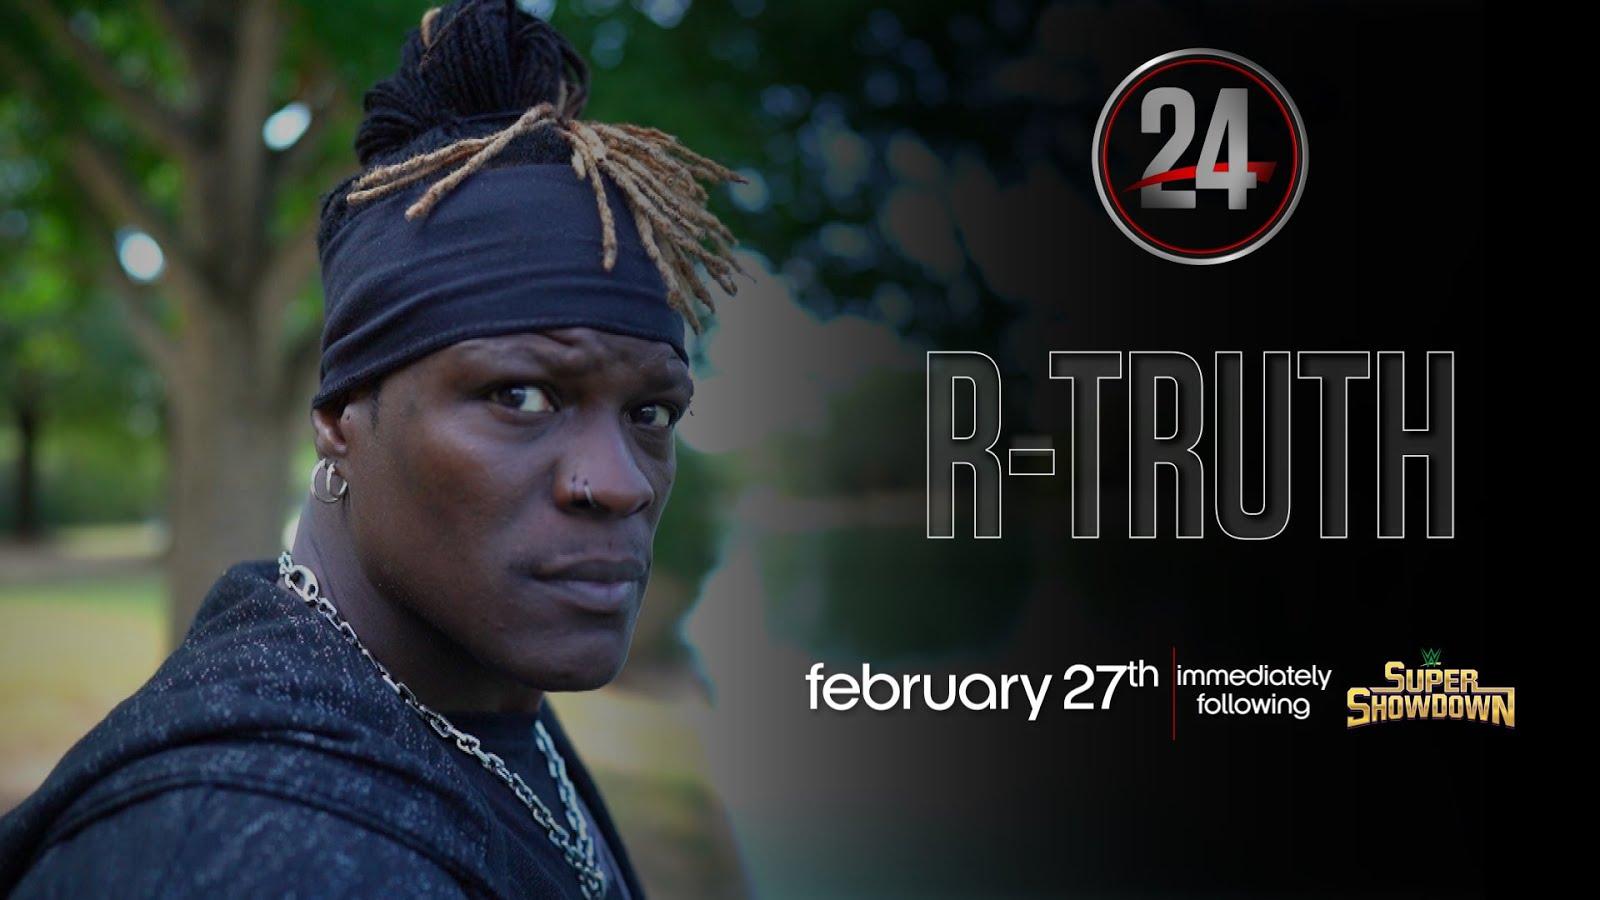 WWE transmitirá WWE 24 especial sobre R-Truth após o Super ShowDown